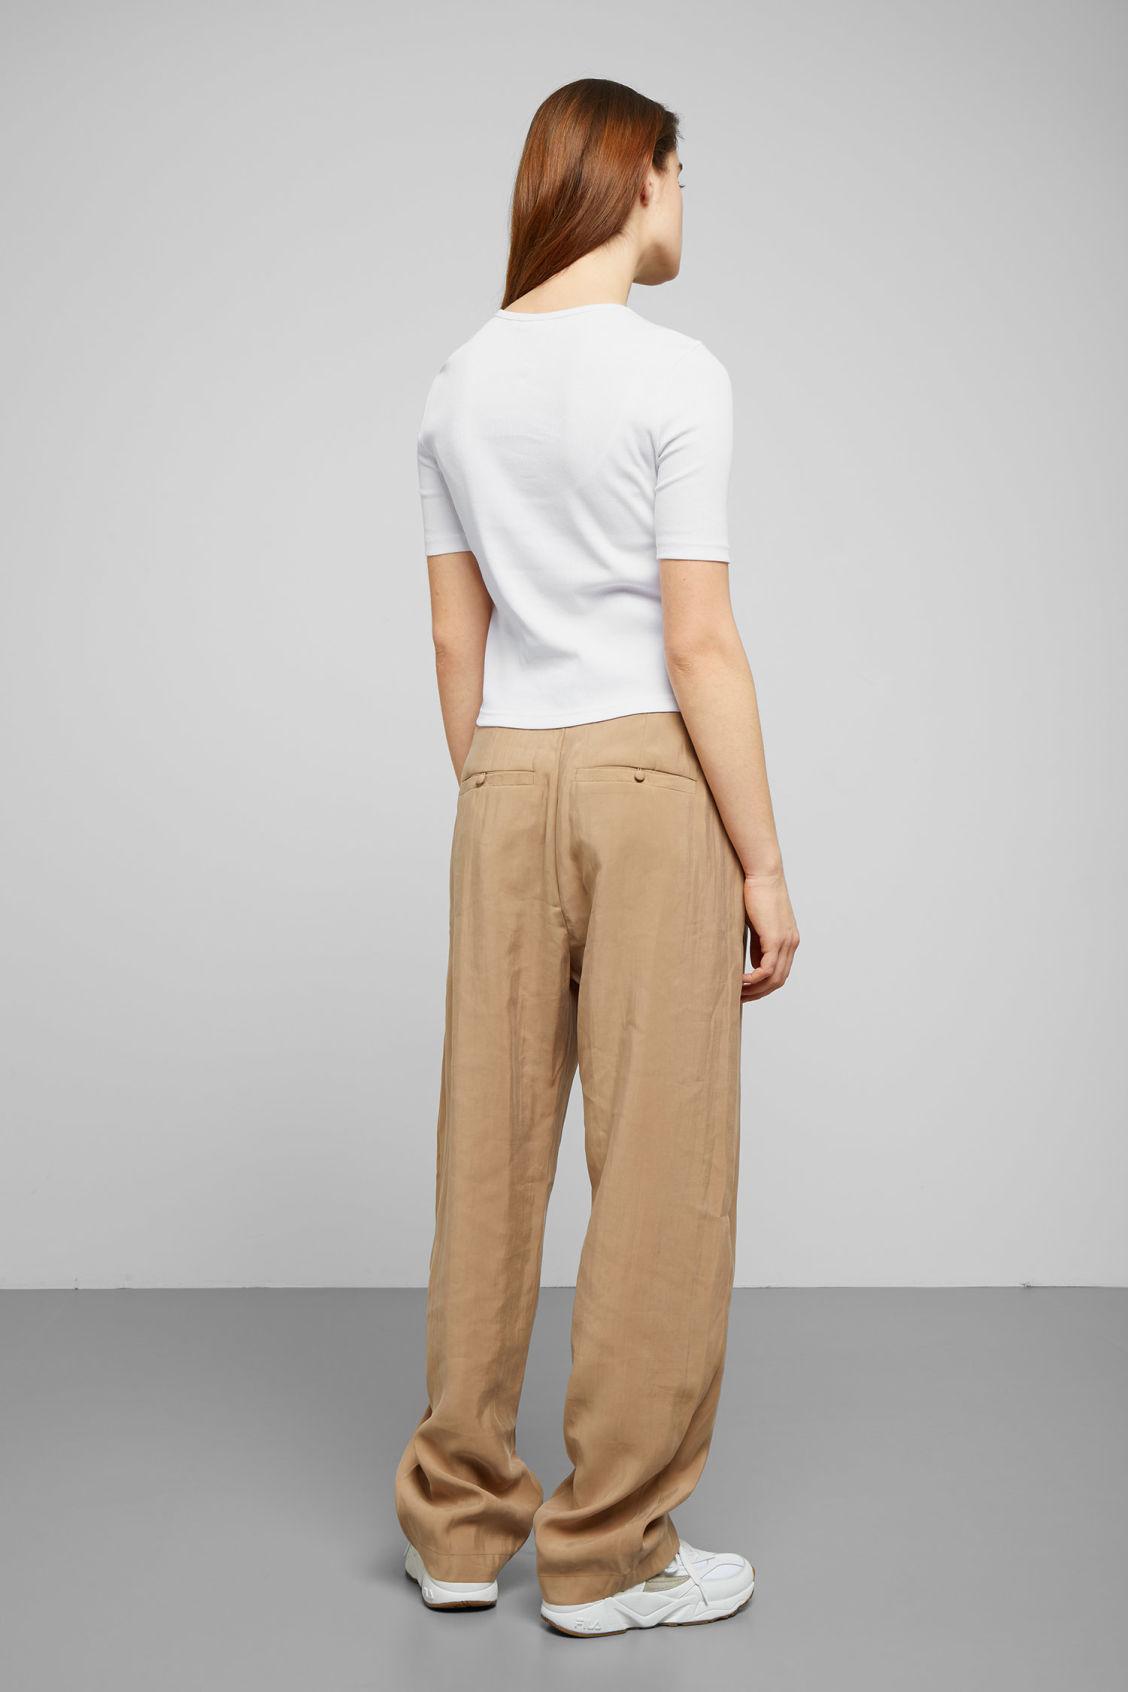 Astrid Rib Tops Weekday T Shirt White 0wnOPk